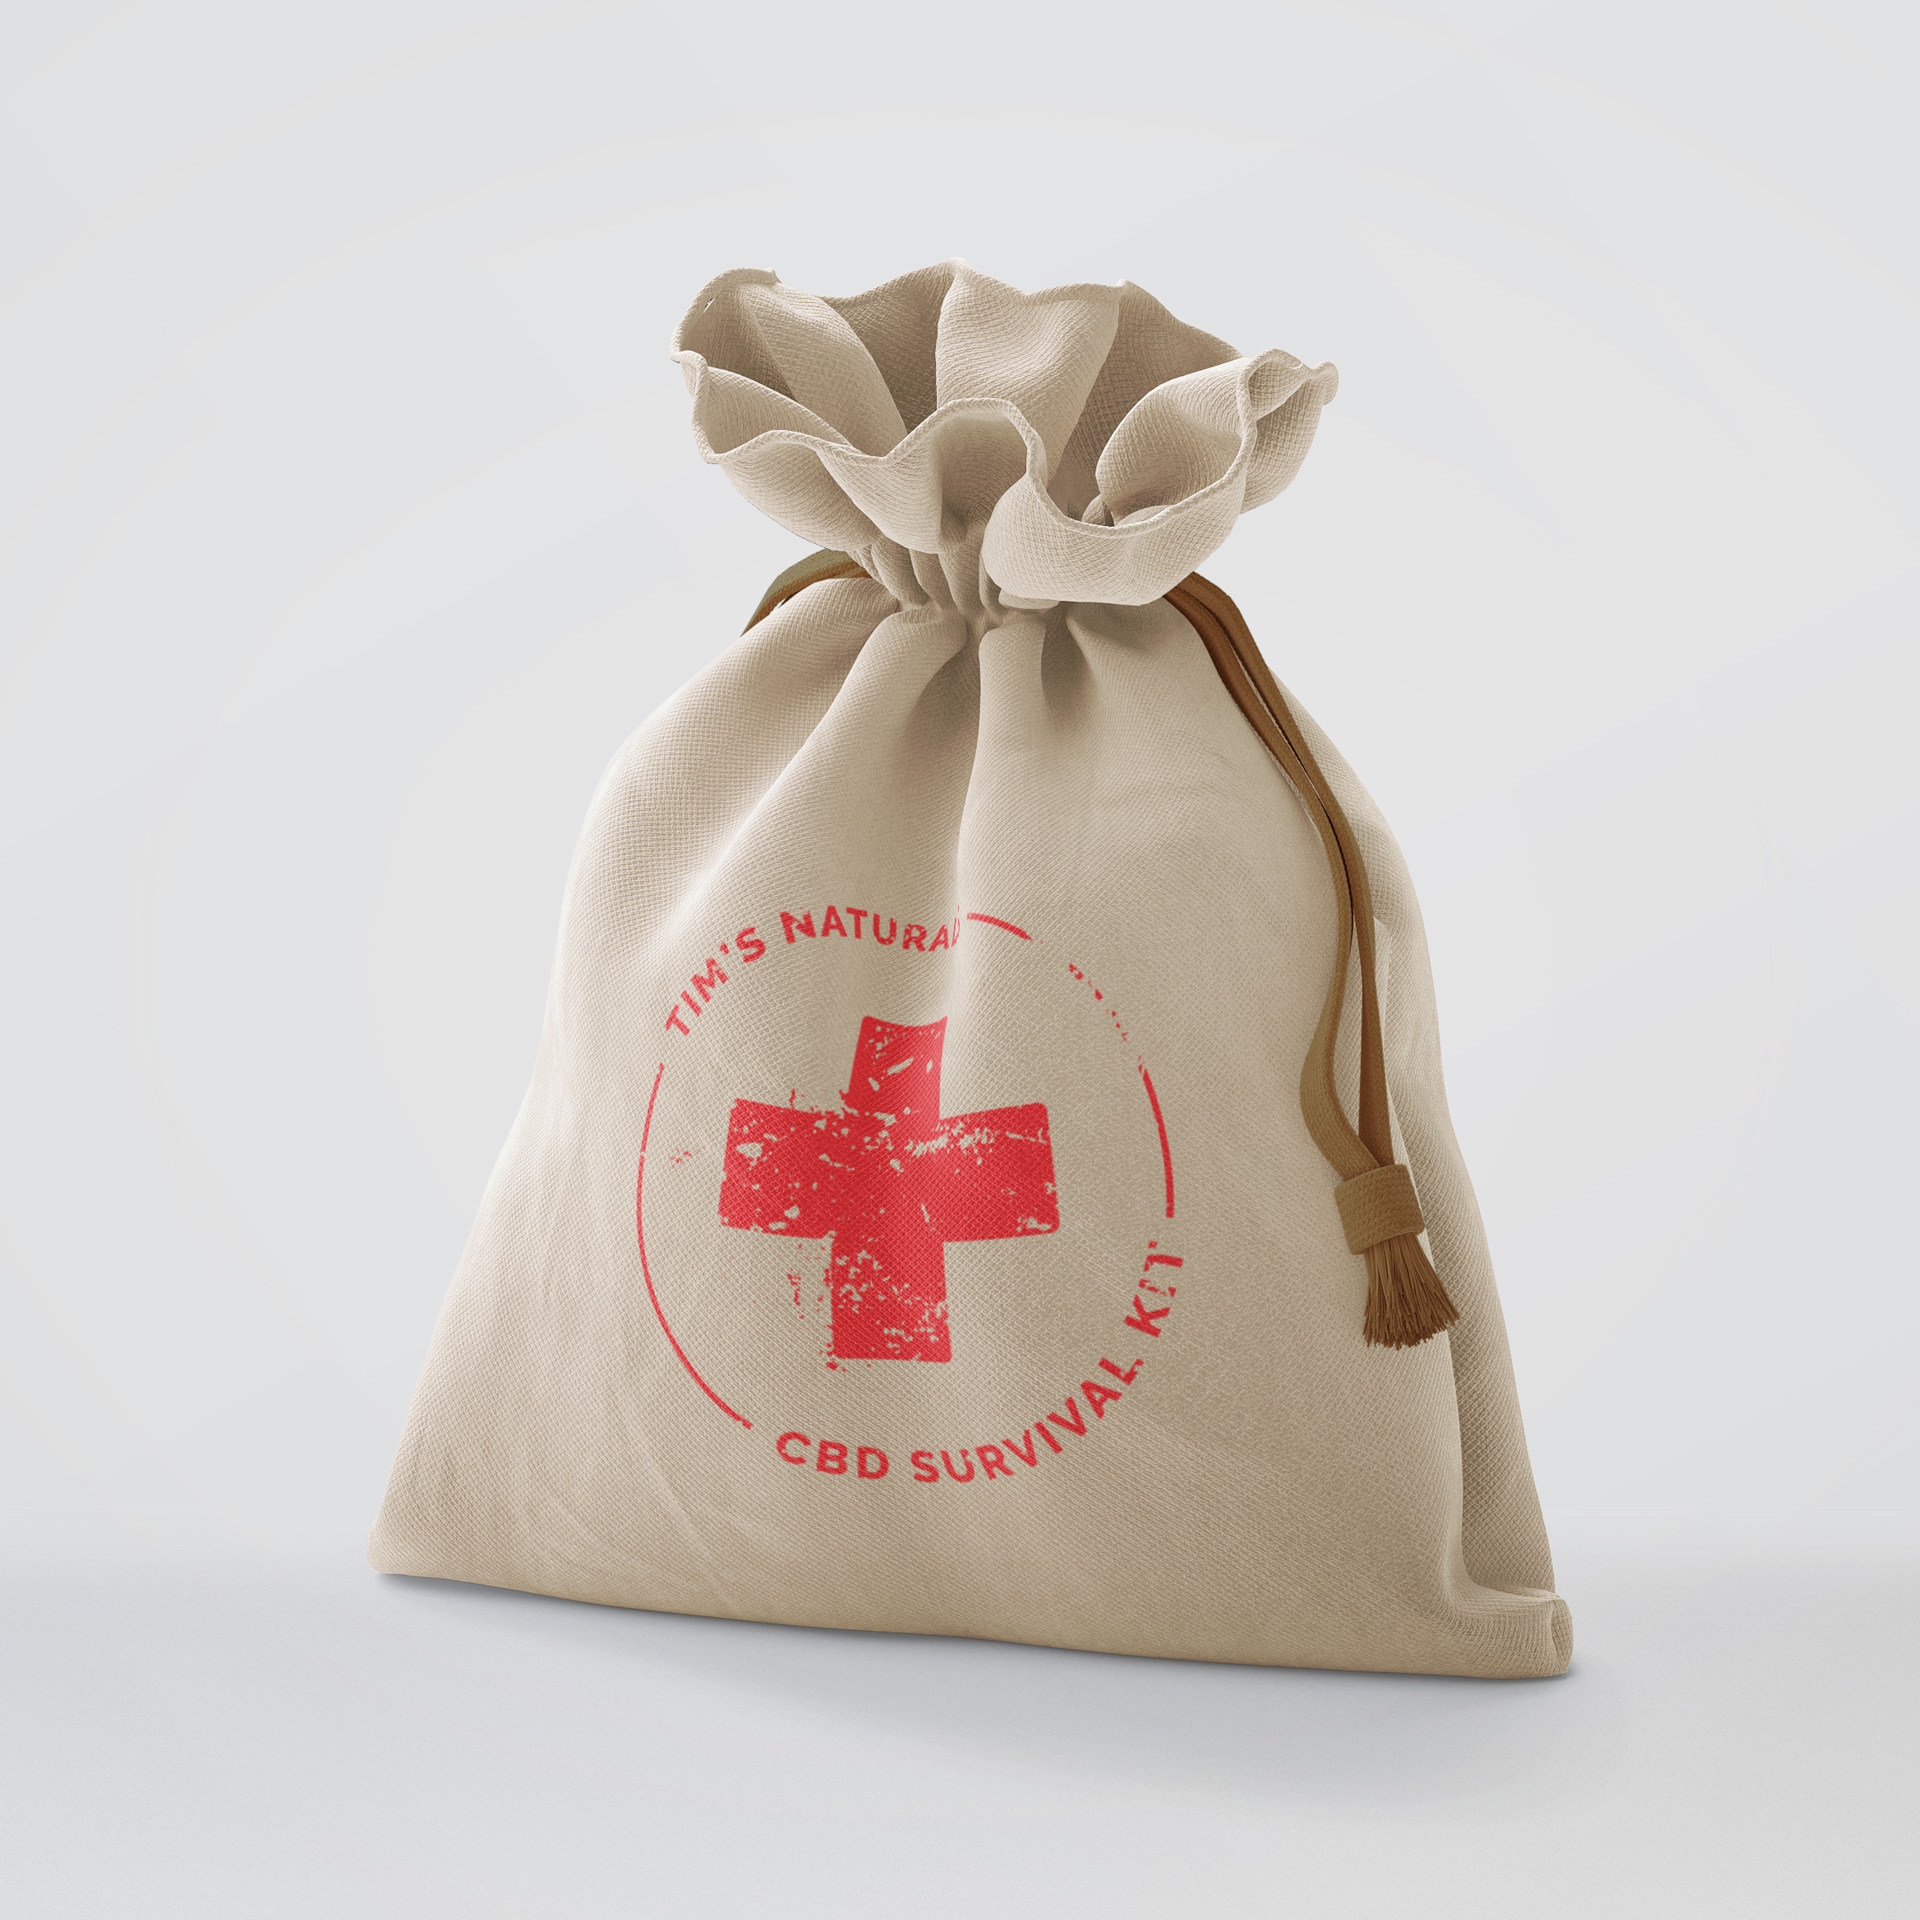 tims-naturals-cbd-survival-kit-drawstring-pouch.jpg